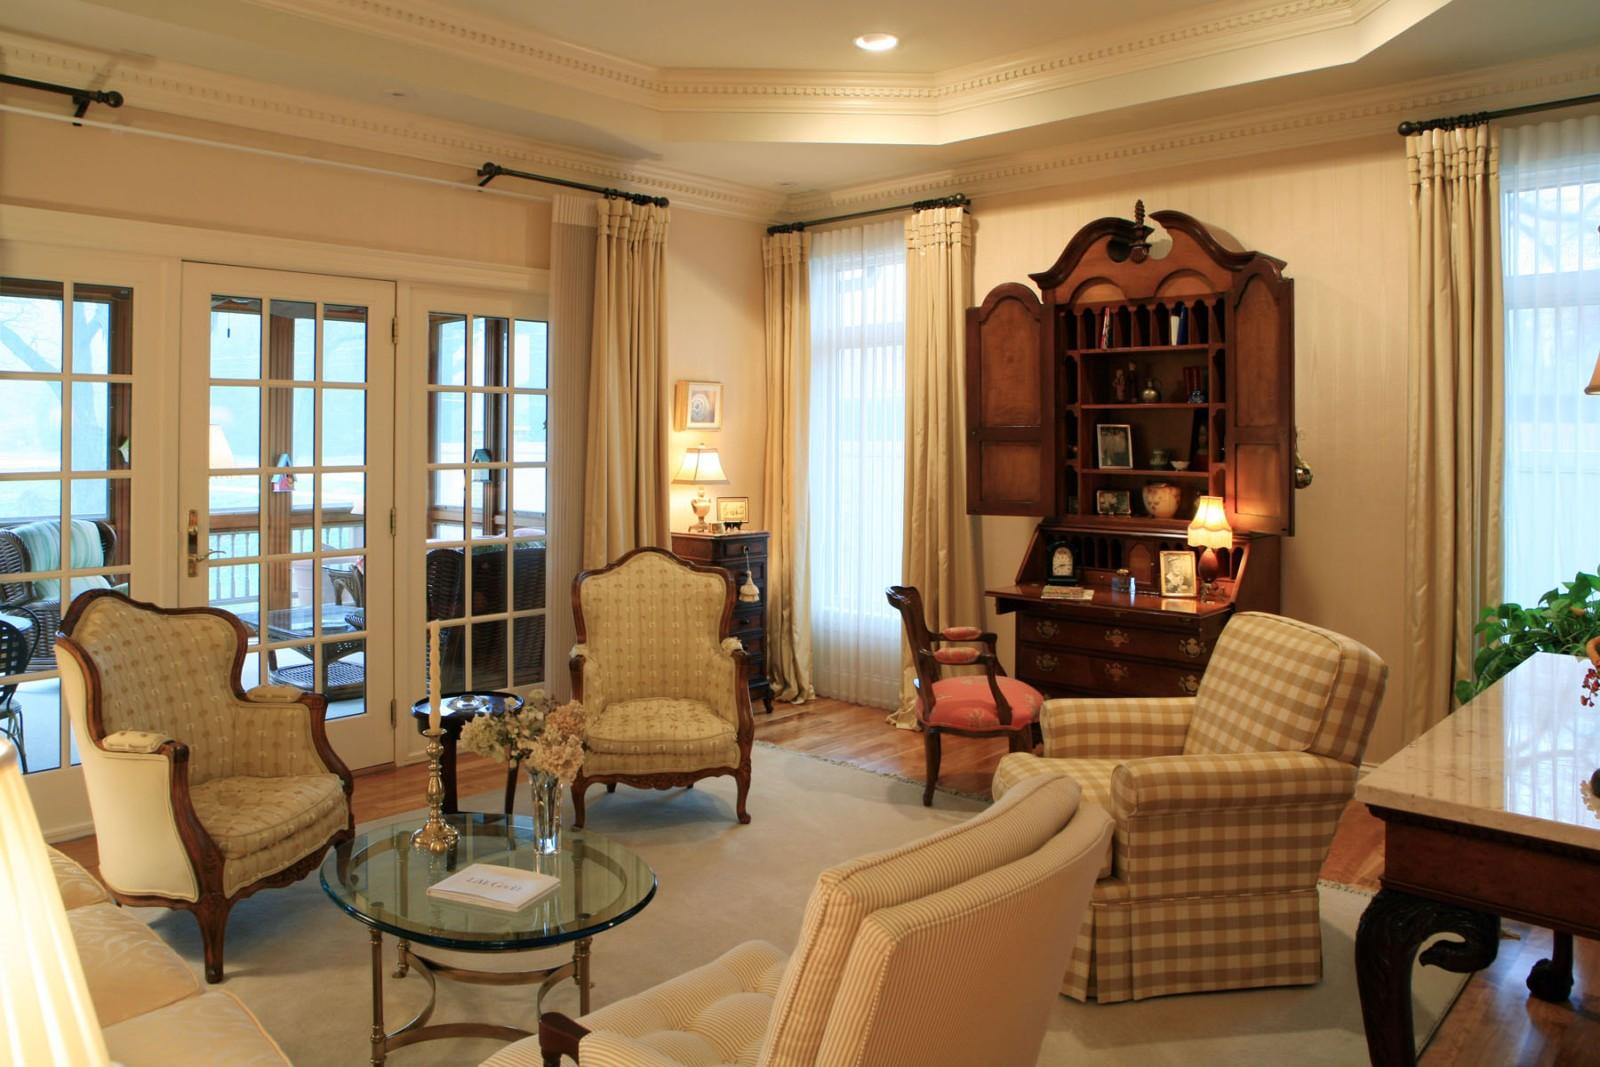 Interior design by Design Surroundings | Living Room